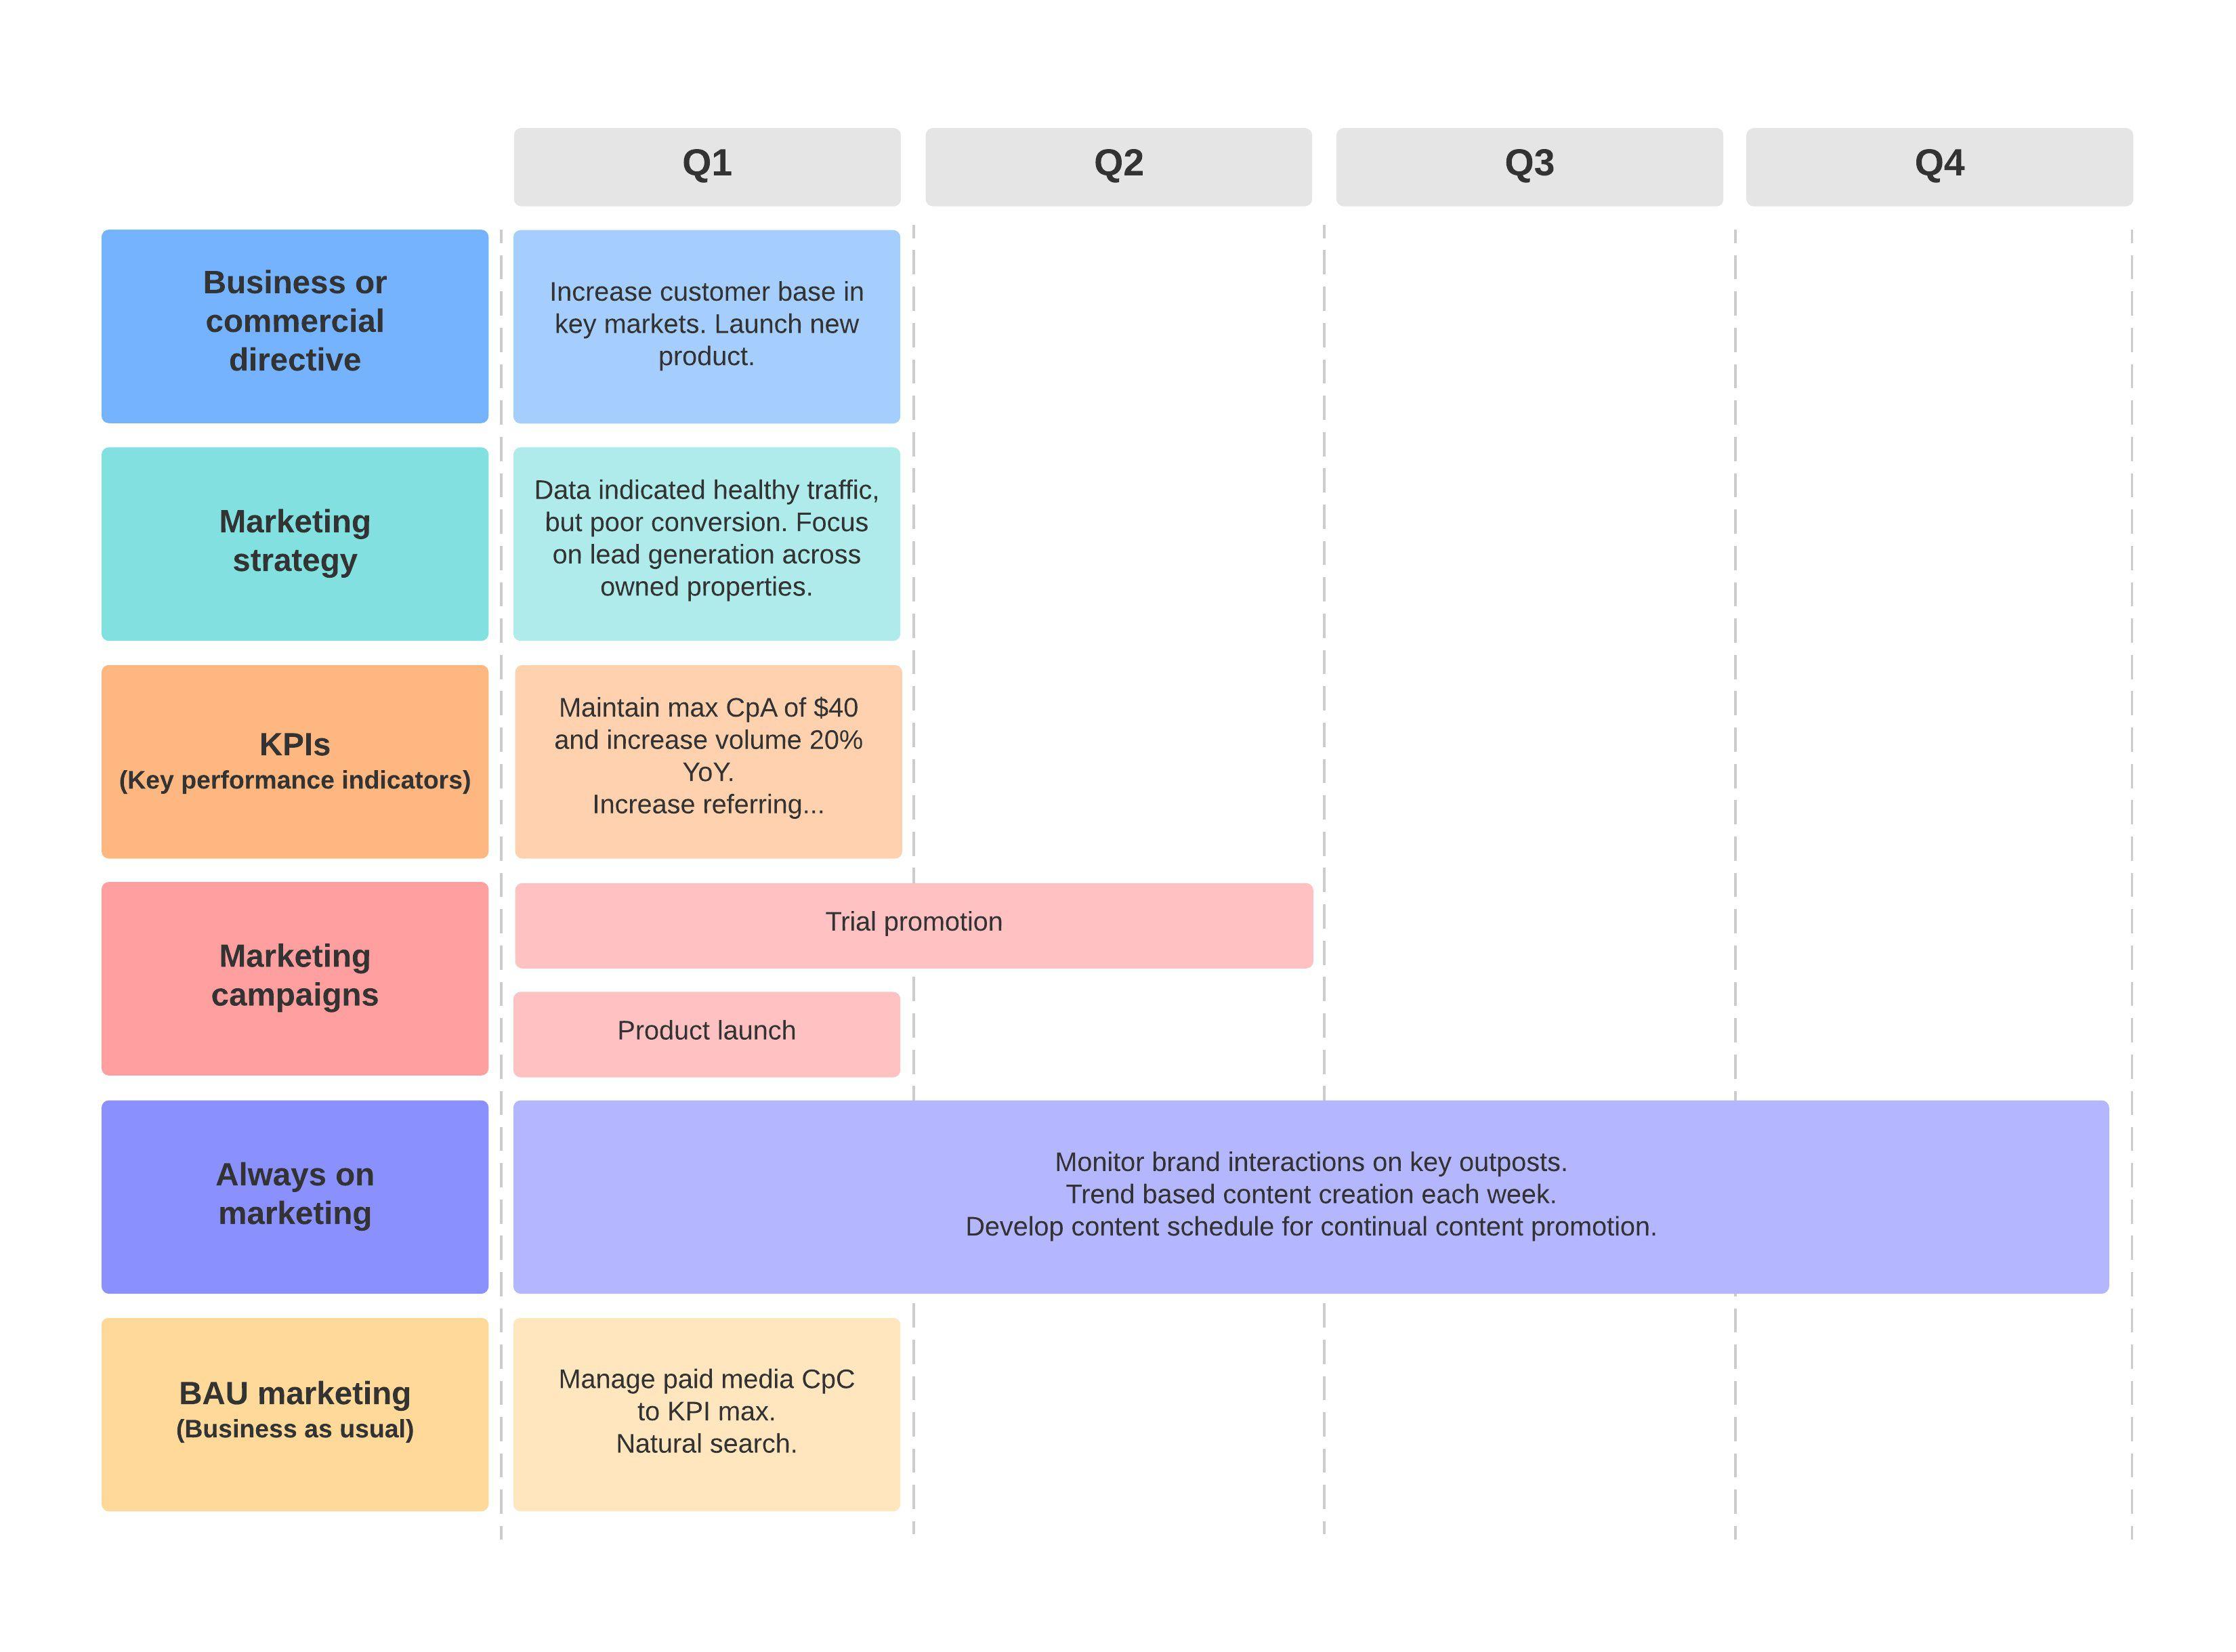 008 Stunning Digital Marketing Plan Template Concept  .xl DocFull